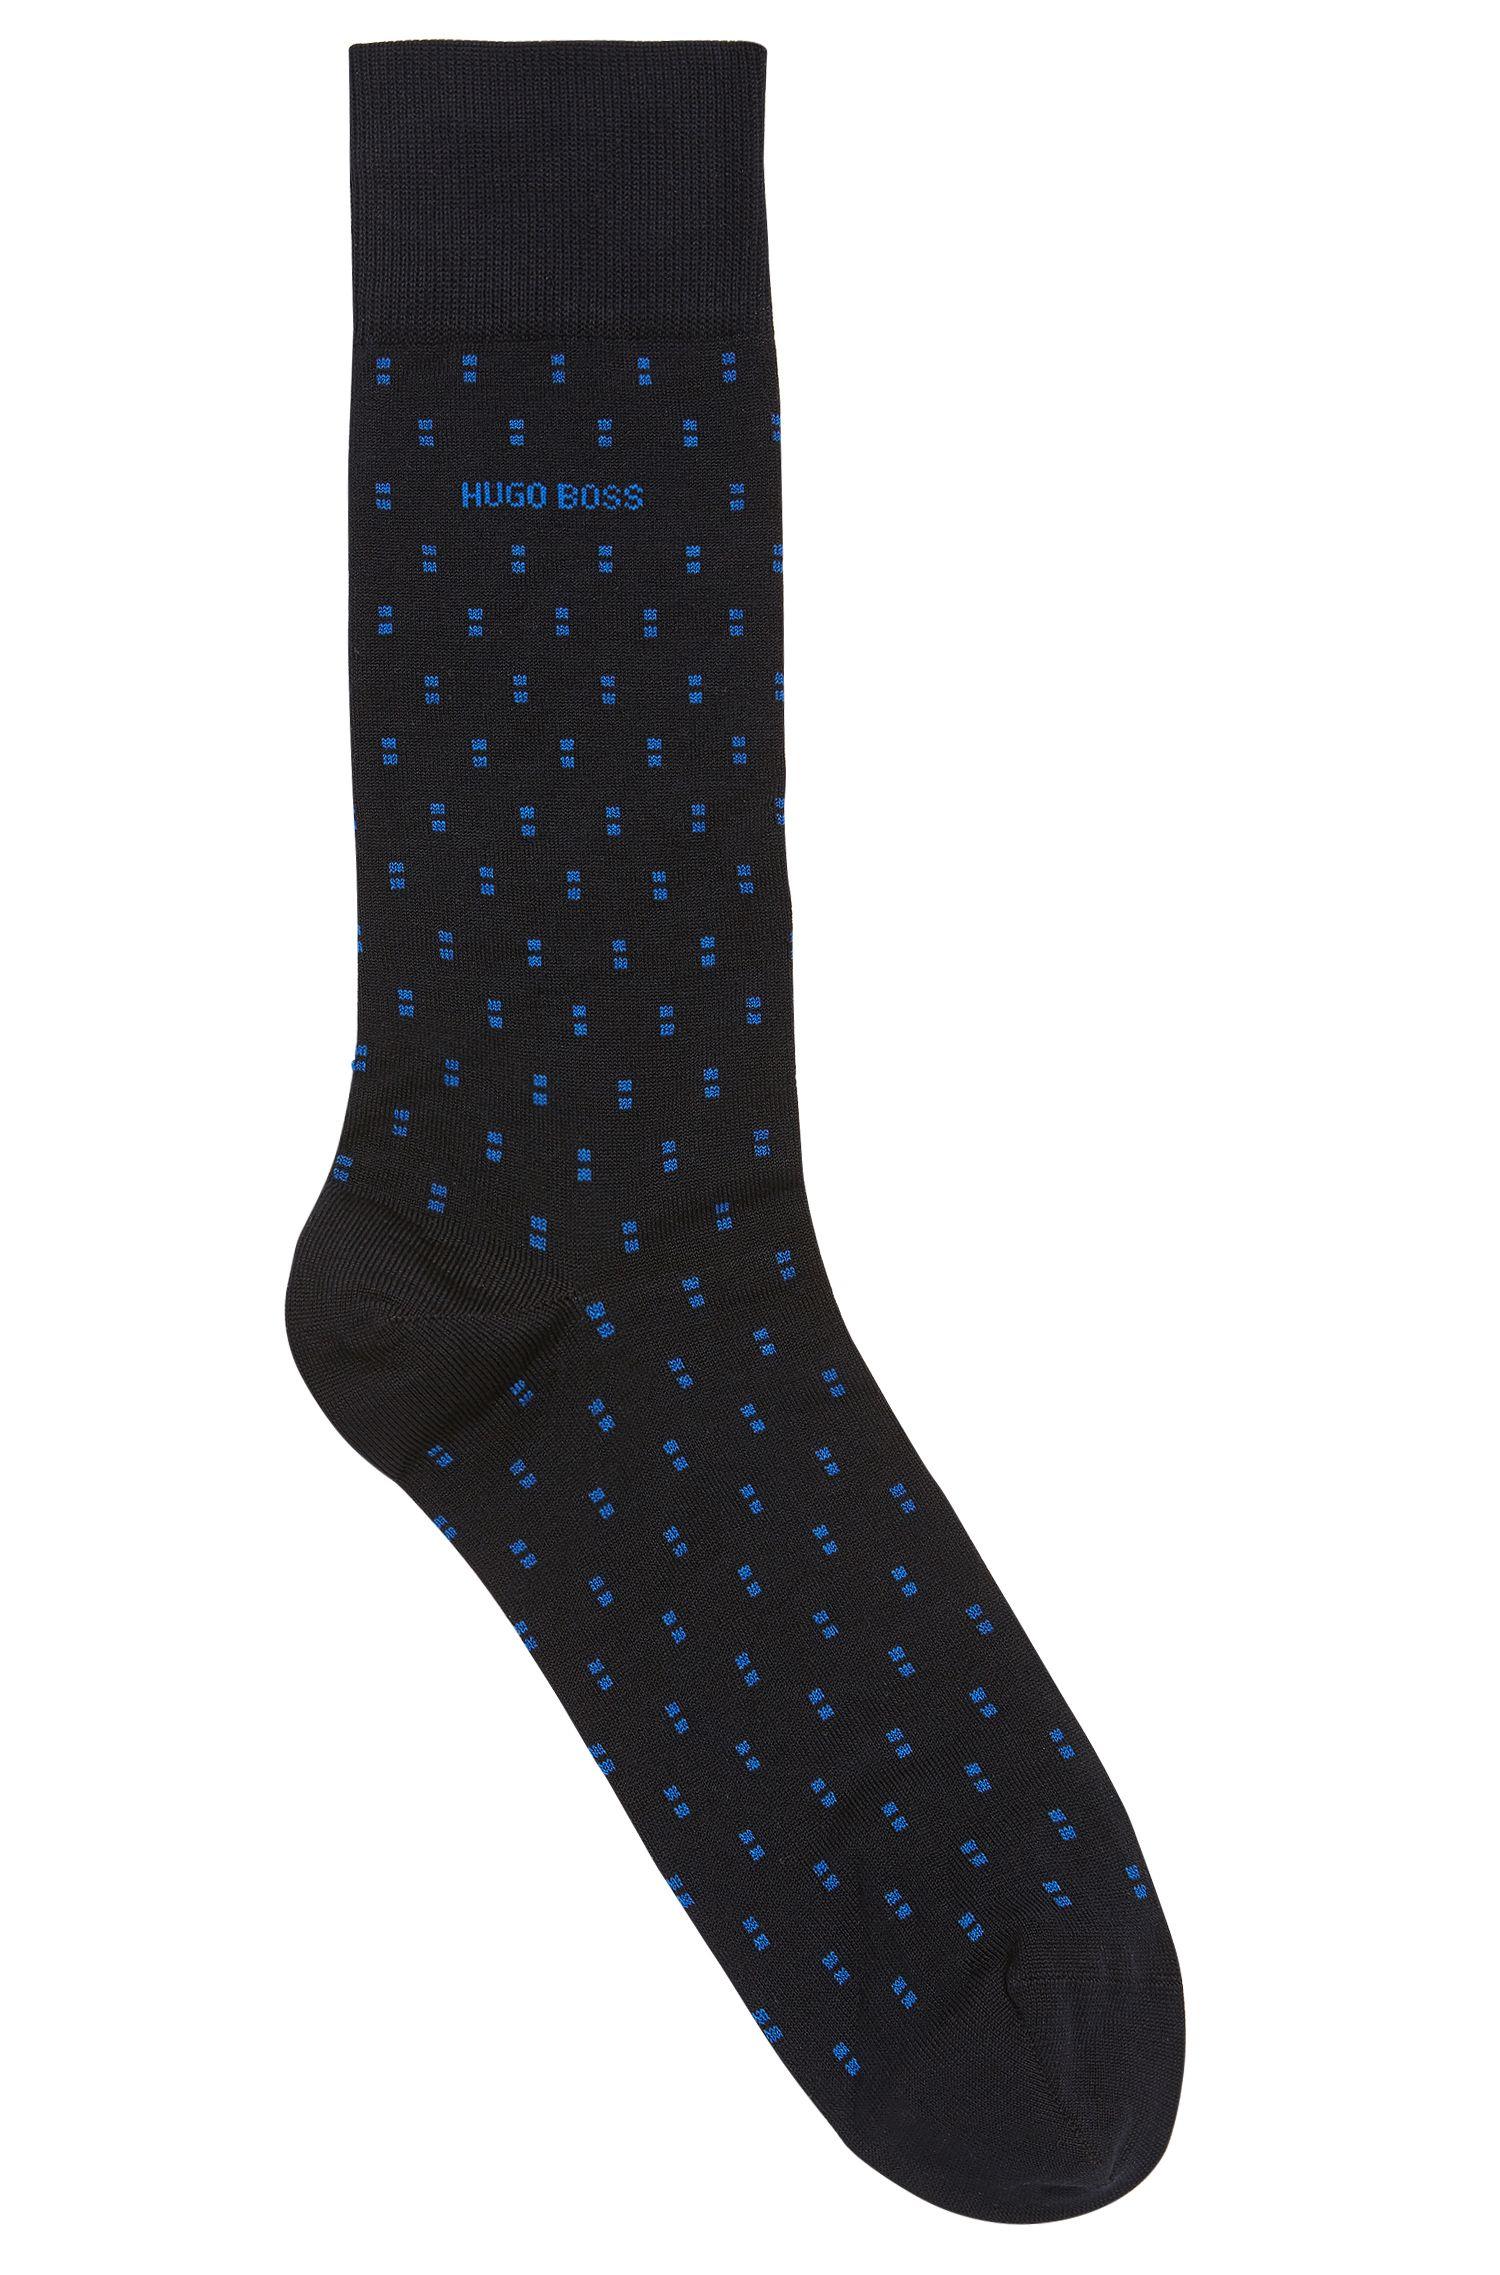 'RS Design US' | Dash Pattern Stretch Cotton Blend Socks